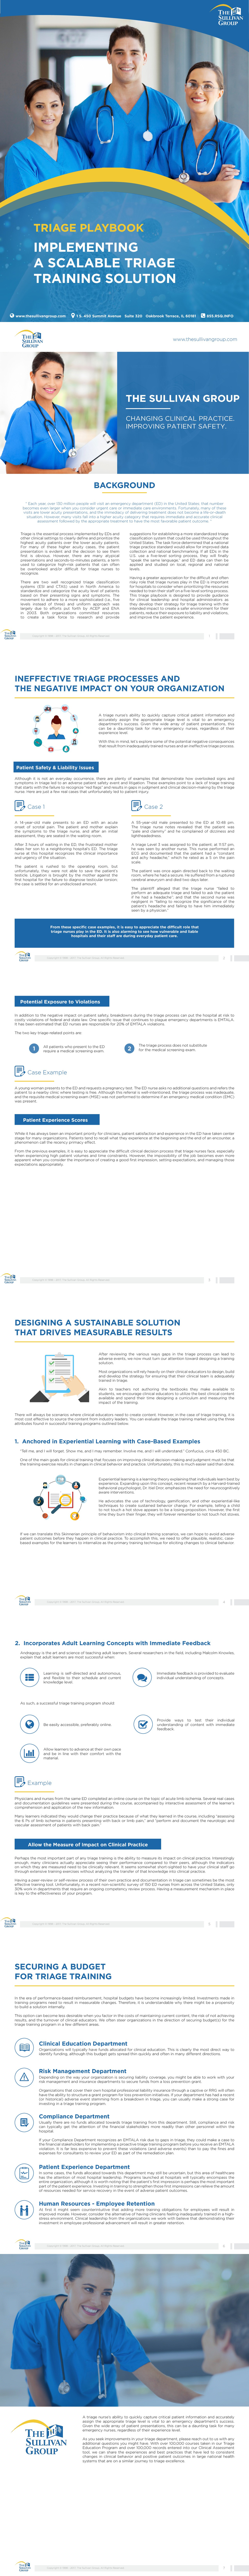 Design an E-Book for Healthcare Education Company